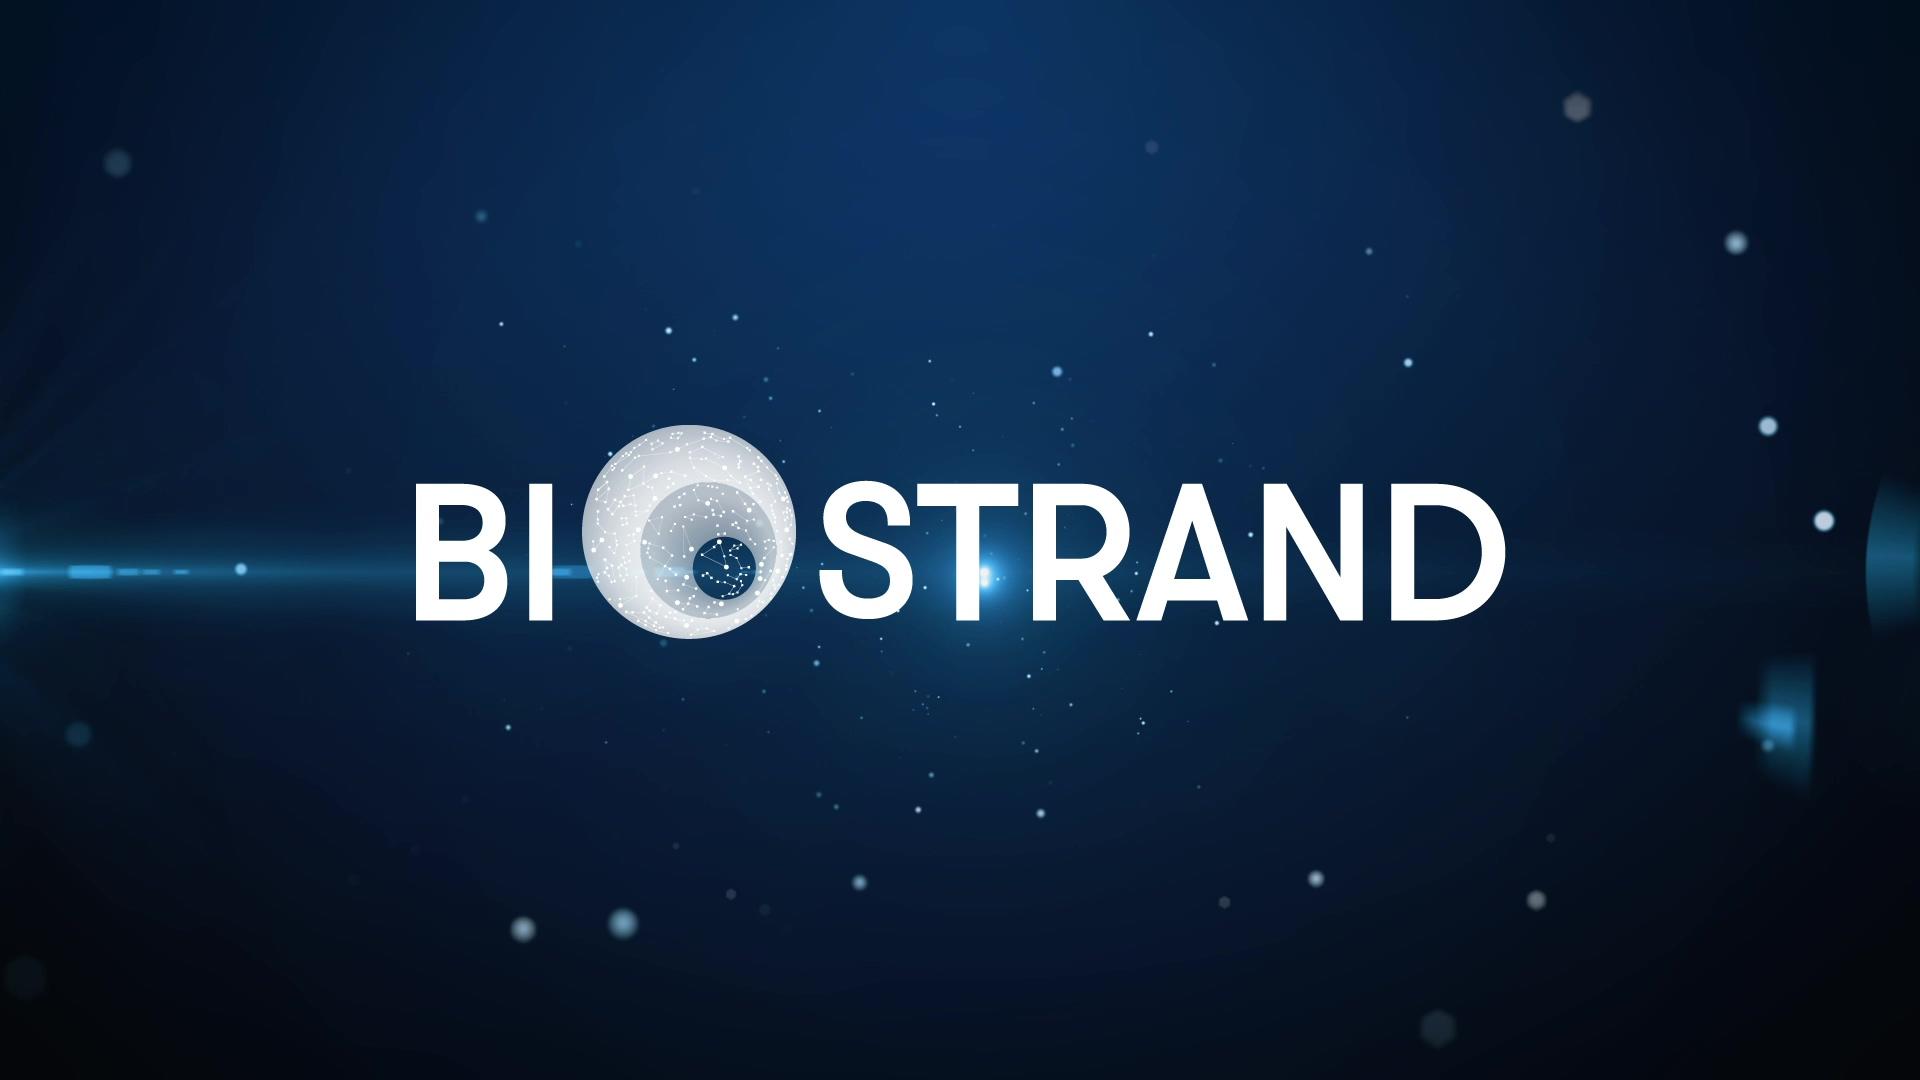 Biostrand_Animatie_edit3 copy